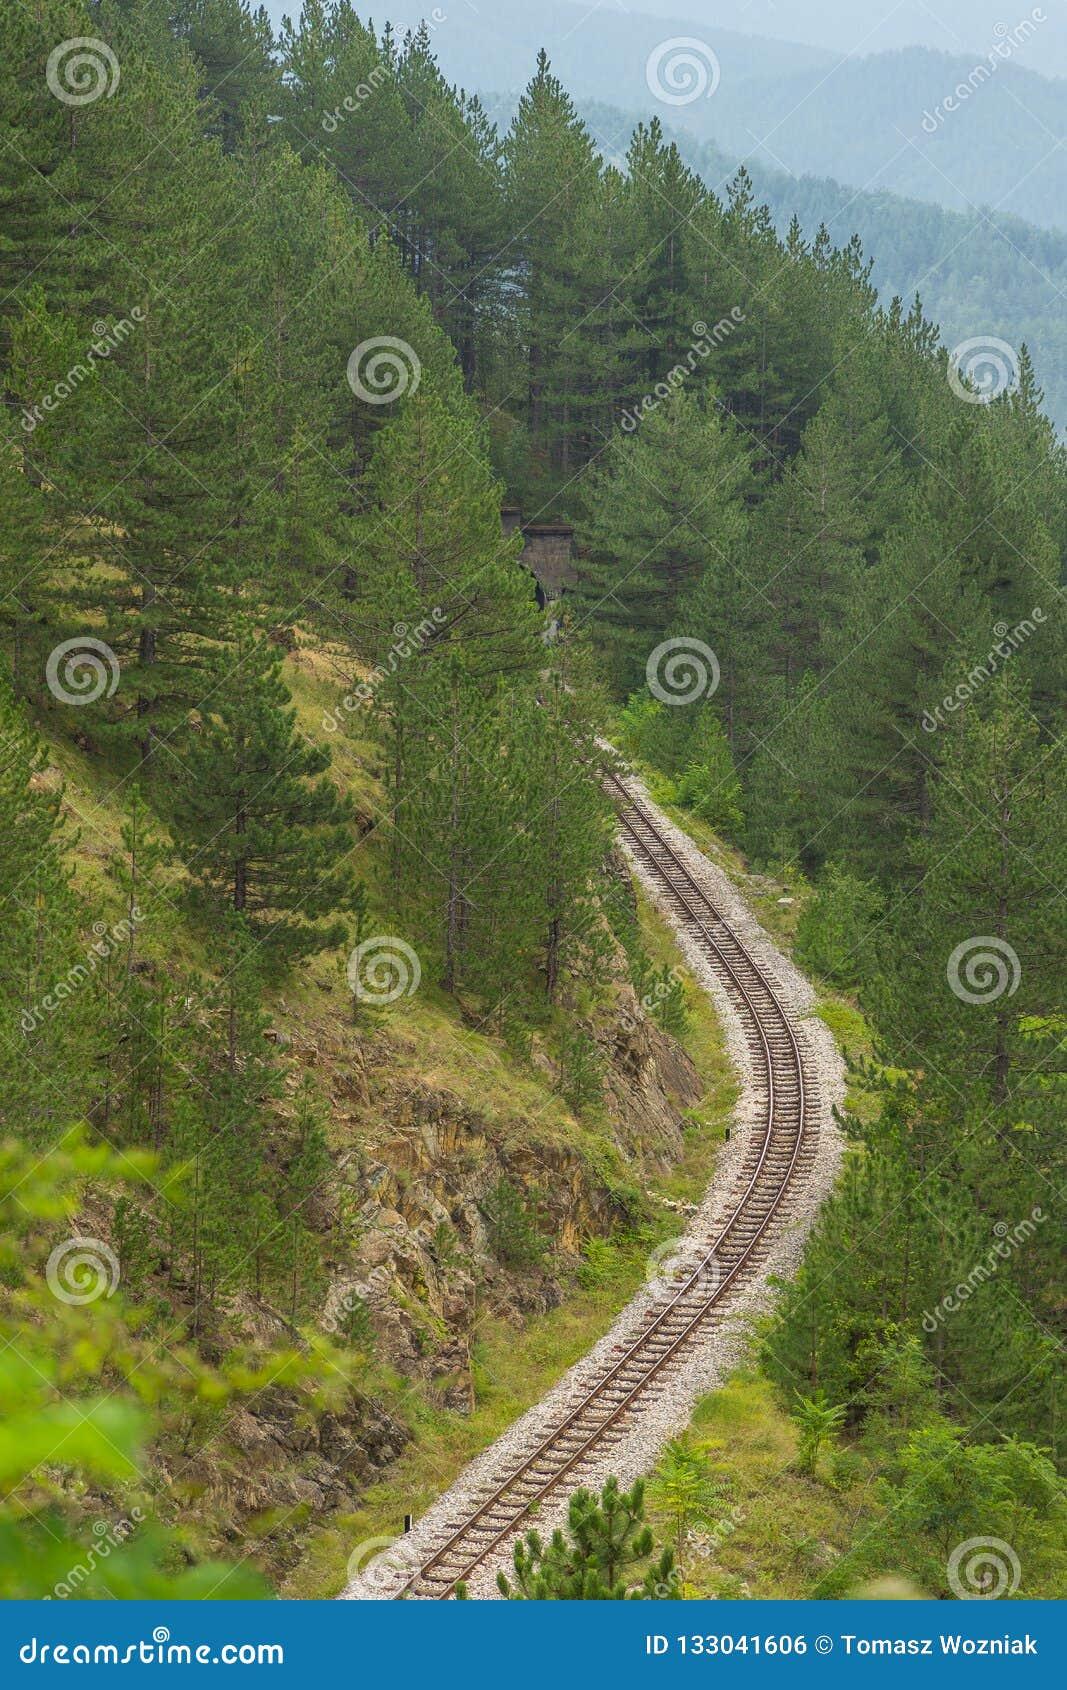 Chemin de fer de Sharganska Osmica entre Mokra Gora et Sargan Vitasi, Serbie